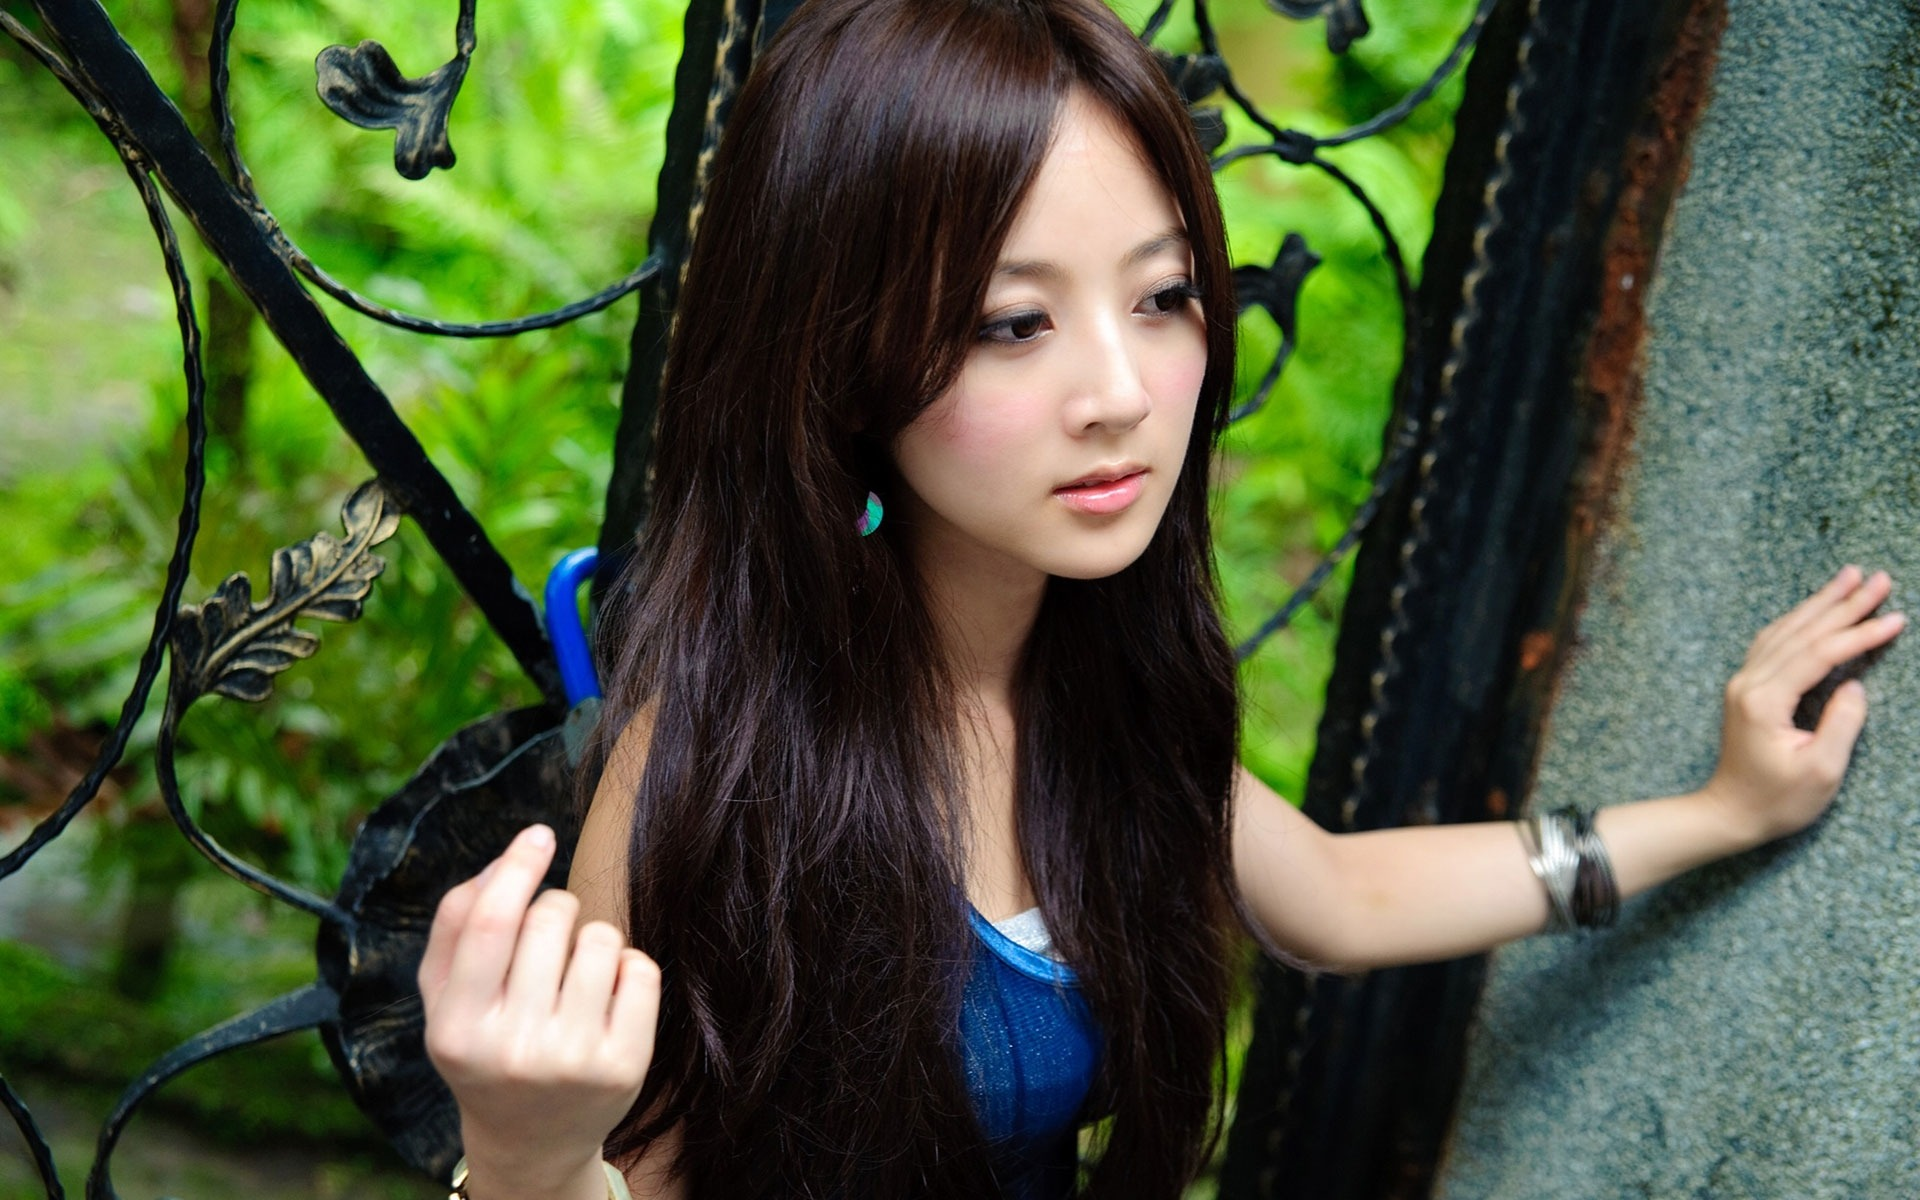 mikako zhang kaijie hd wallpaper  background image